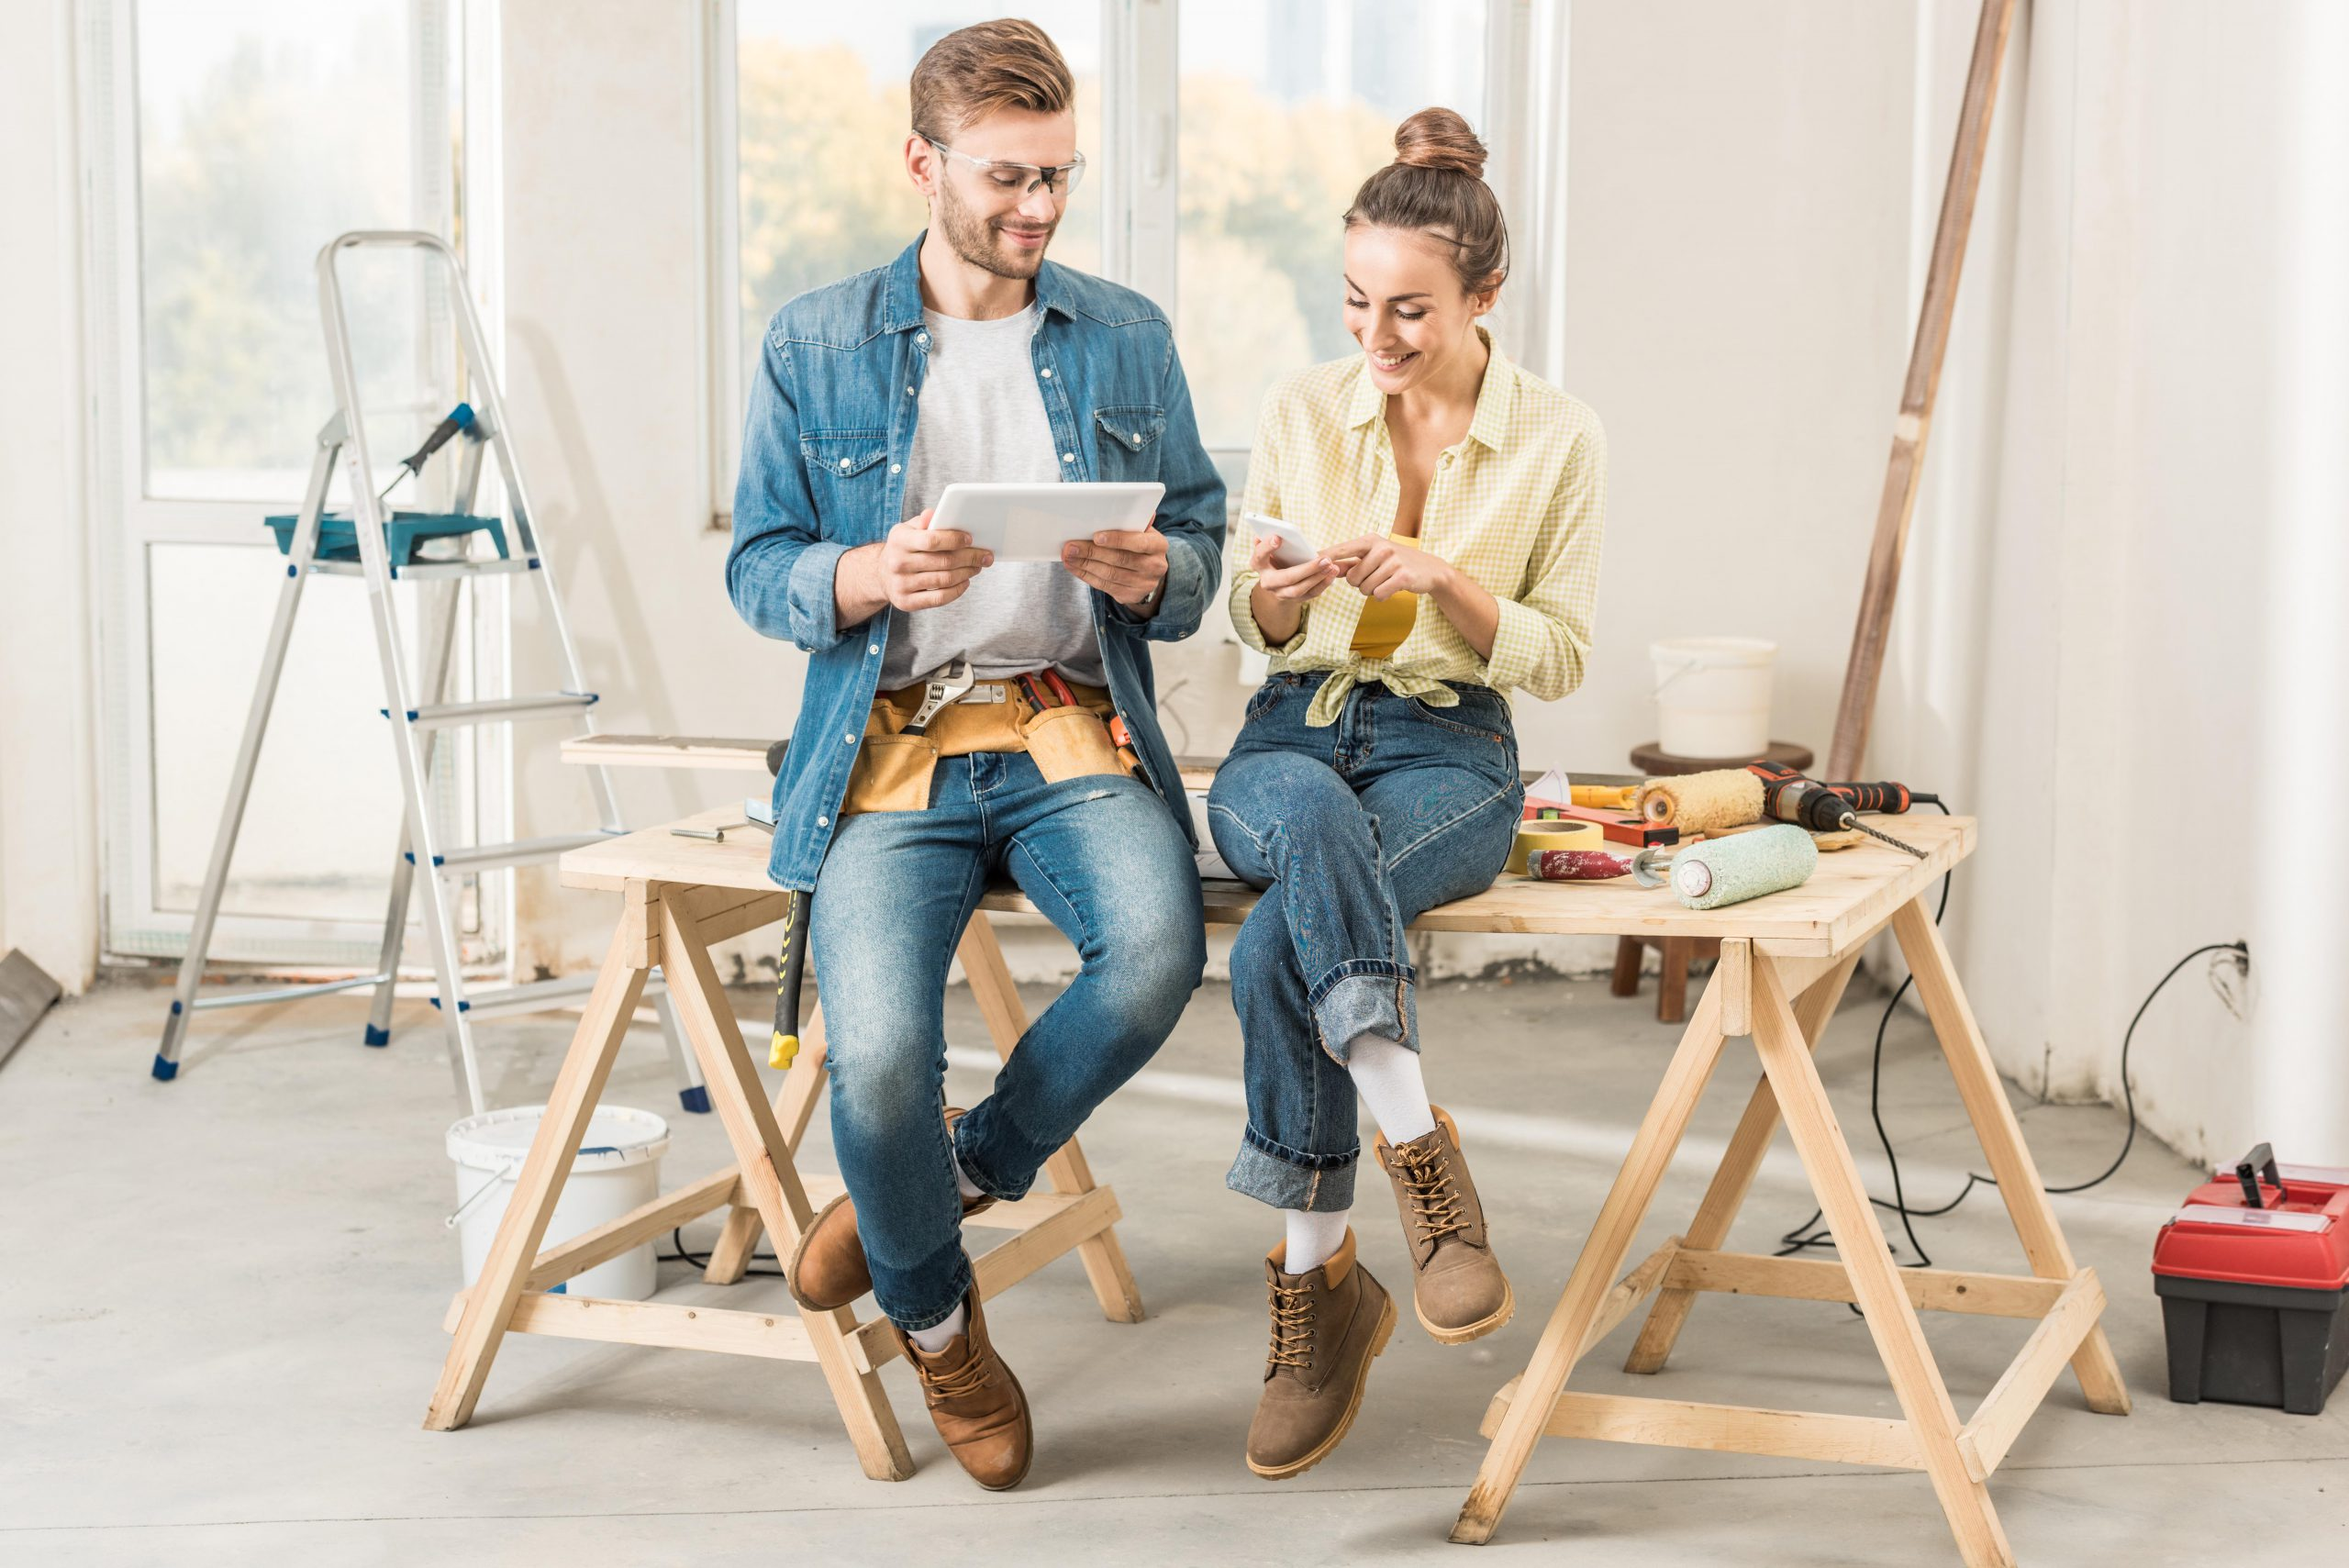 Millennials and Home Improvement Seminar for 2021 True Value Reunion